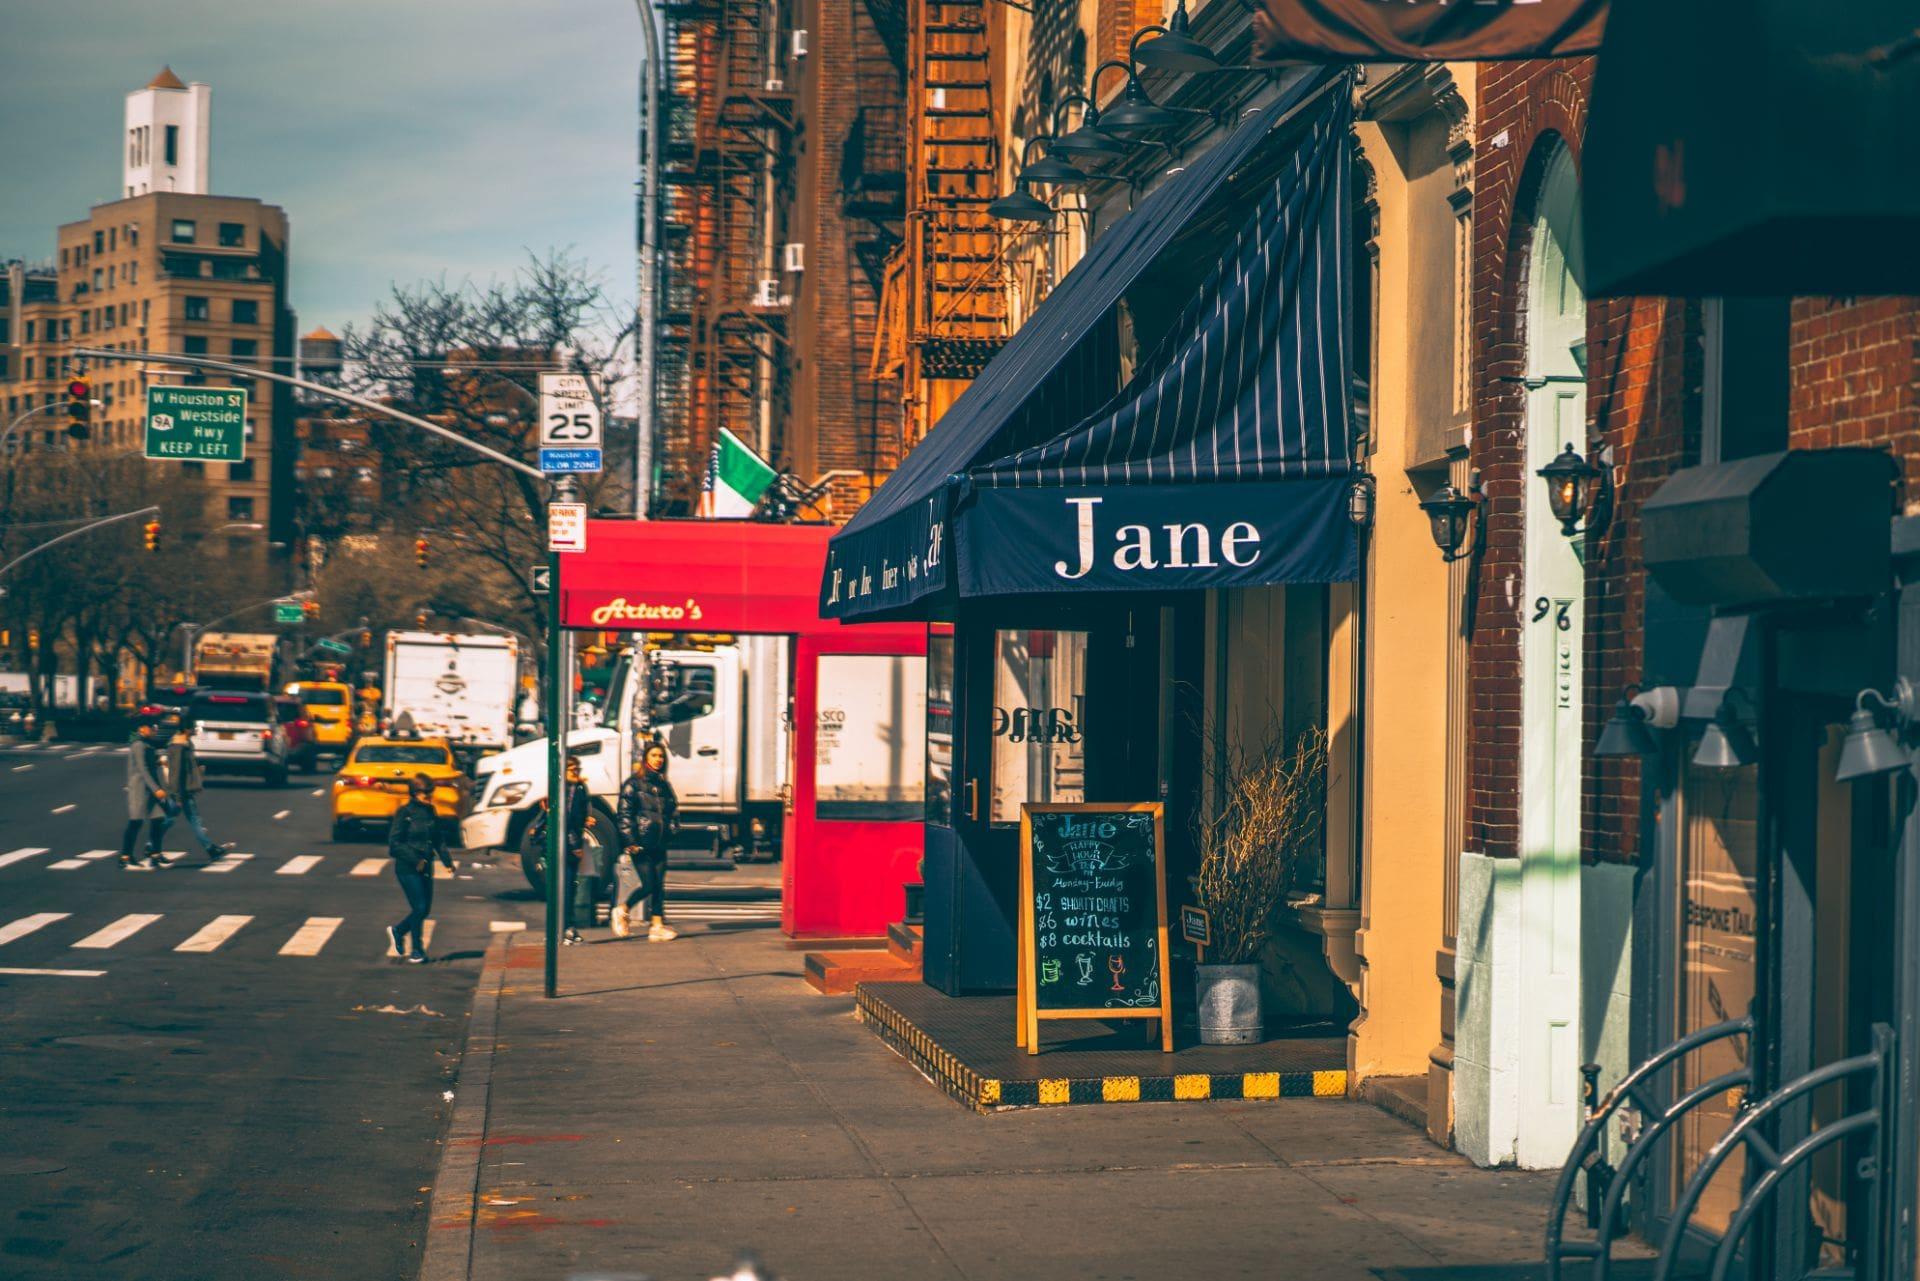 jane-restaurant-in-greenwich-village-a-brunch-spot-in-new-york-city